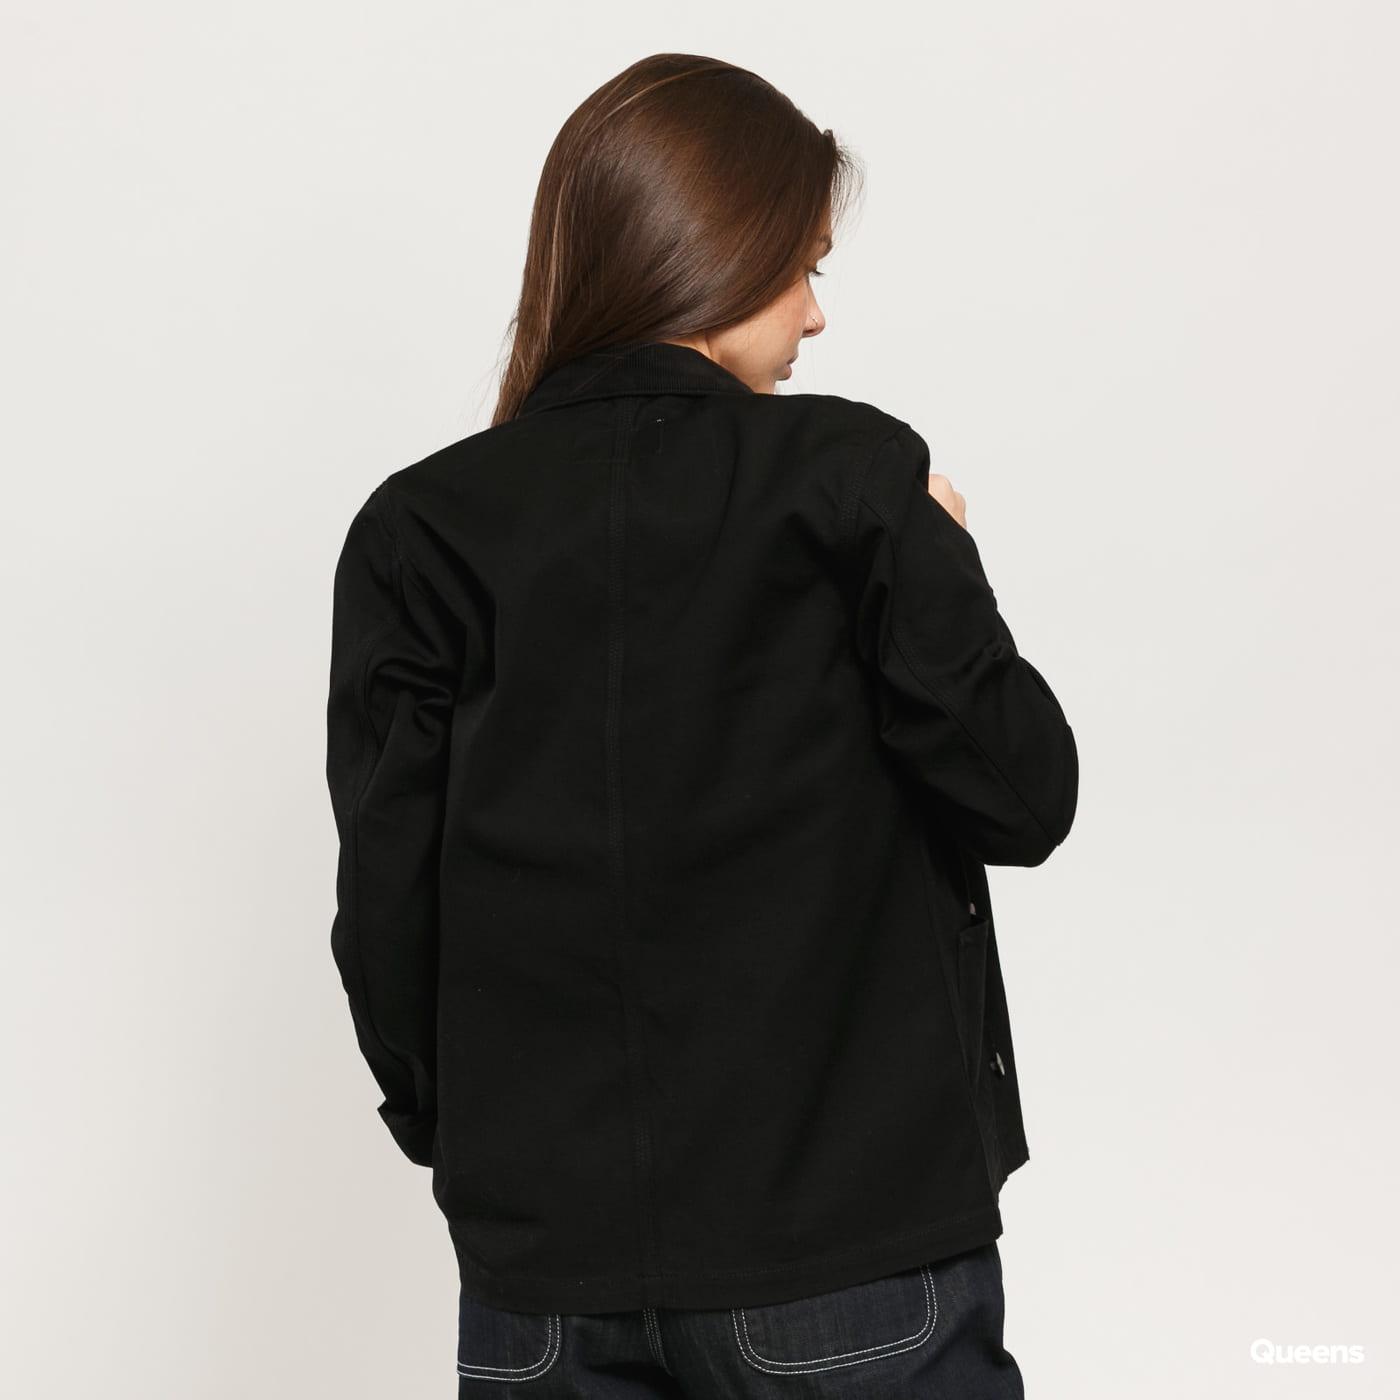 Carhartt WIP W Michigan Jacket black rinsed